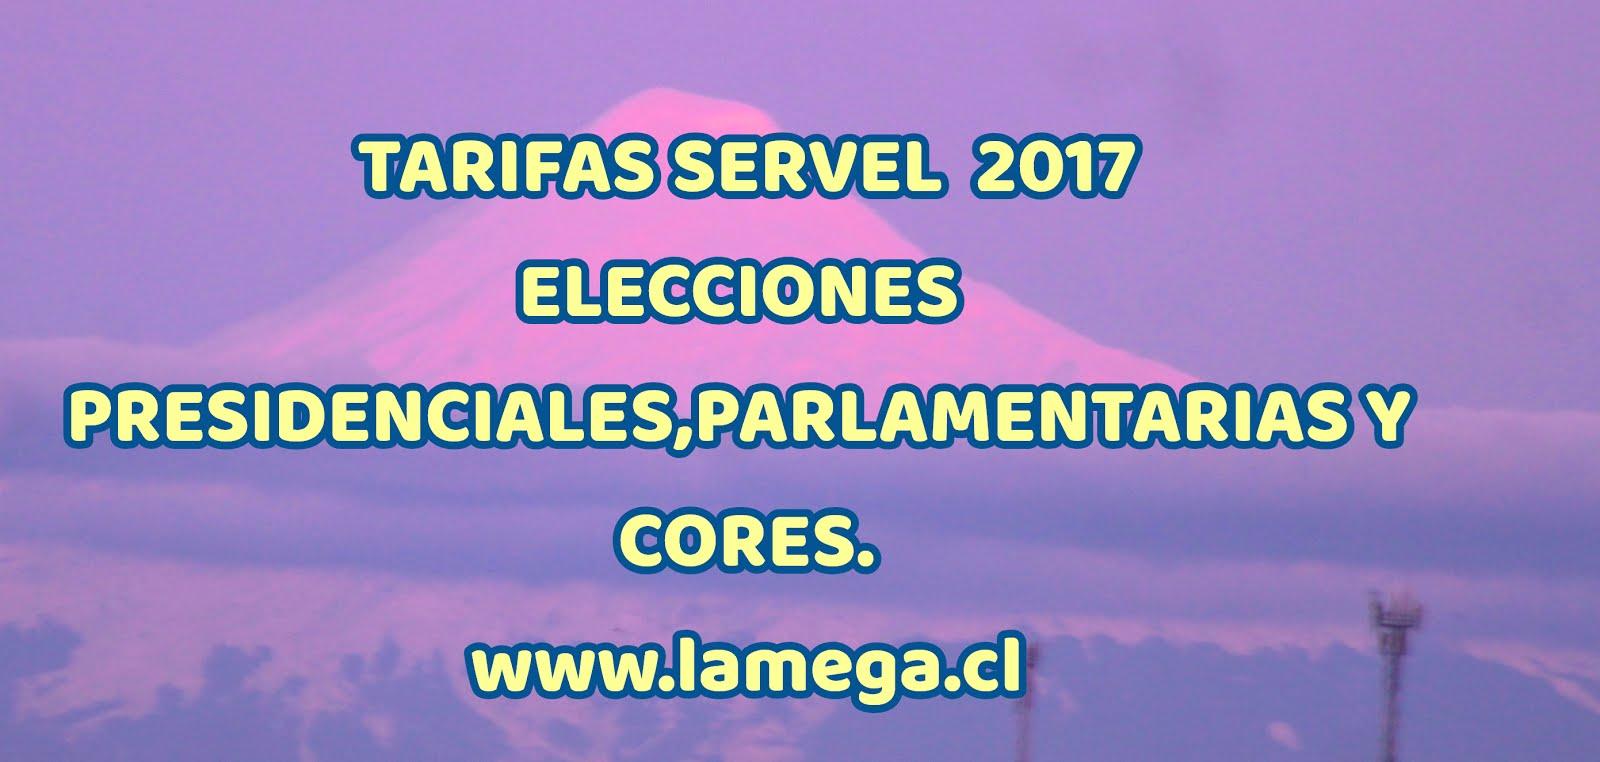 TARIFAS SERVEL 2017